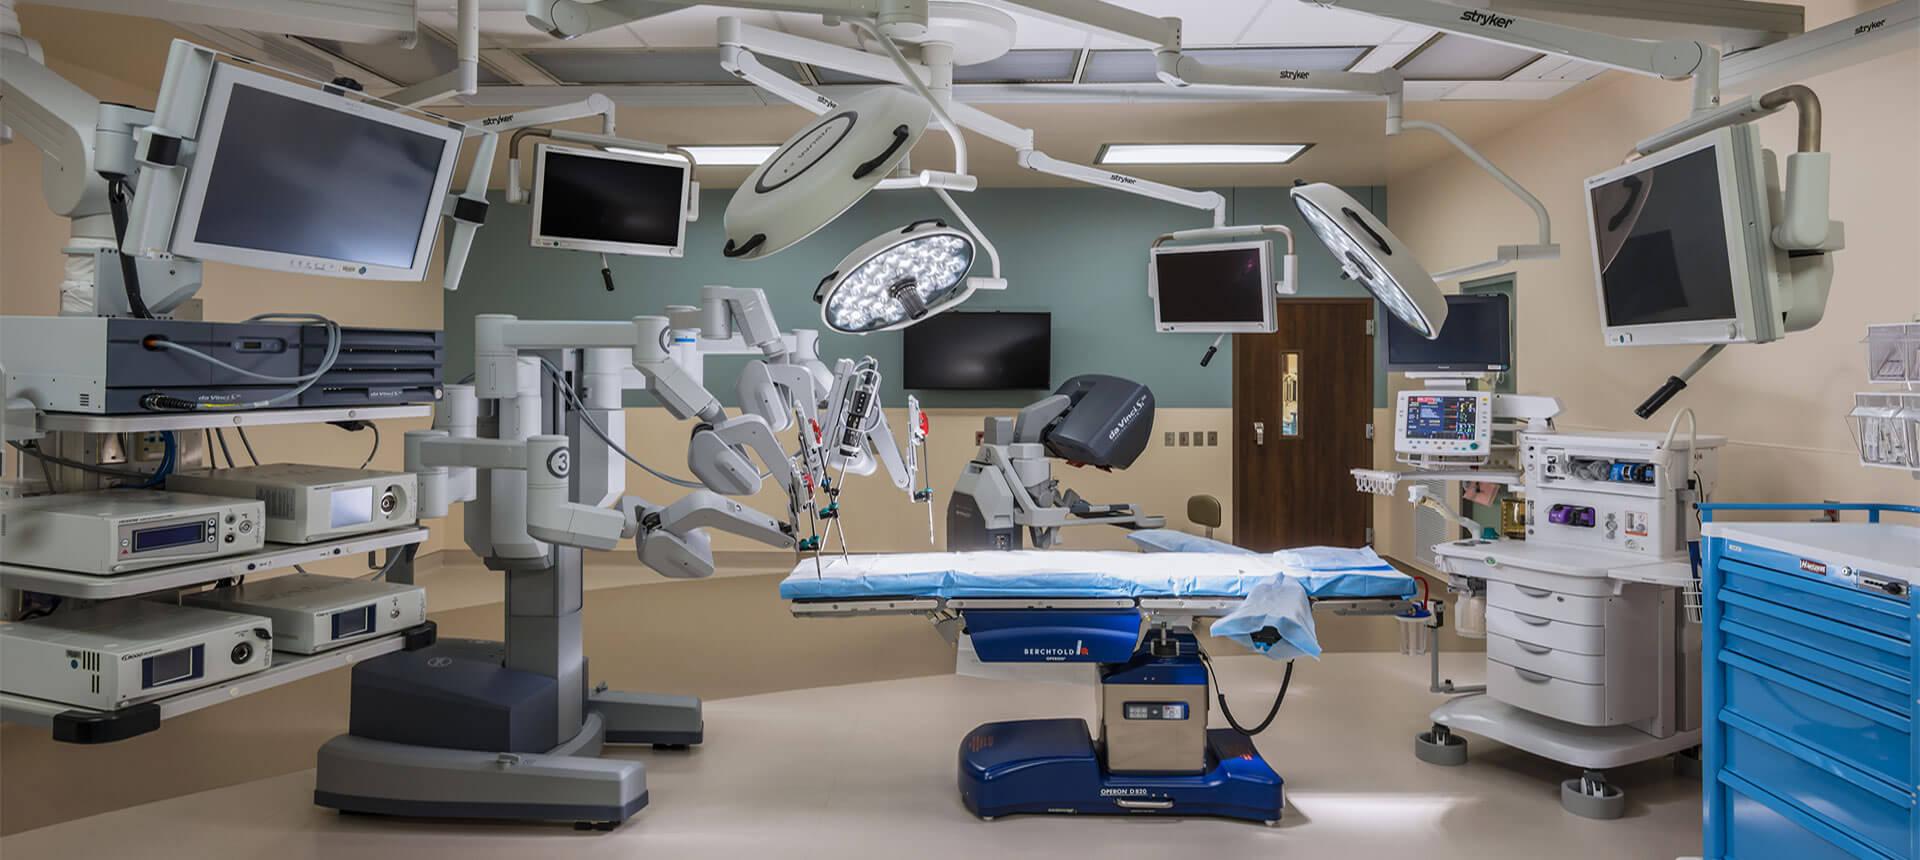 Baylor McKinney Healthcare Technology